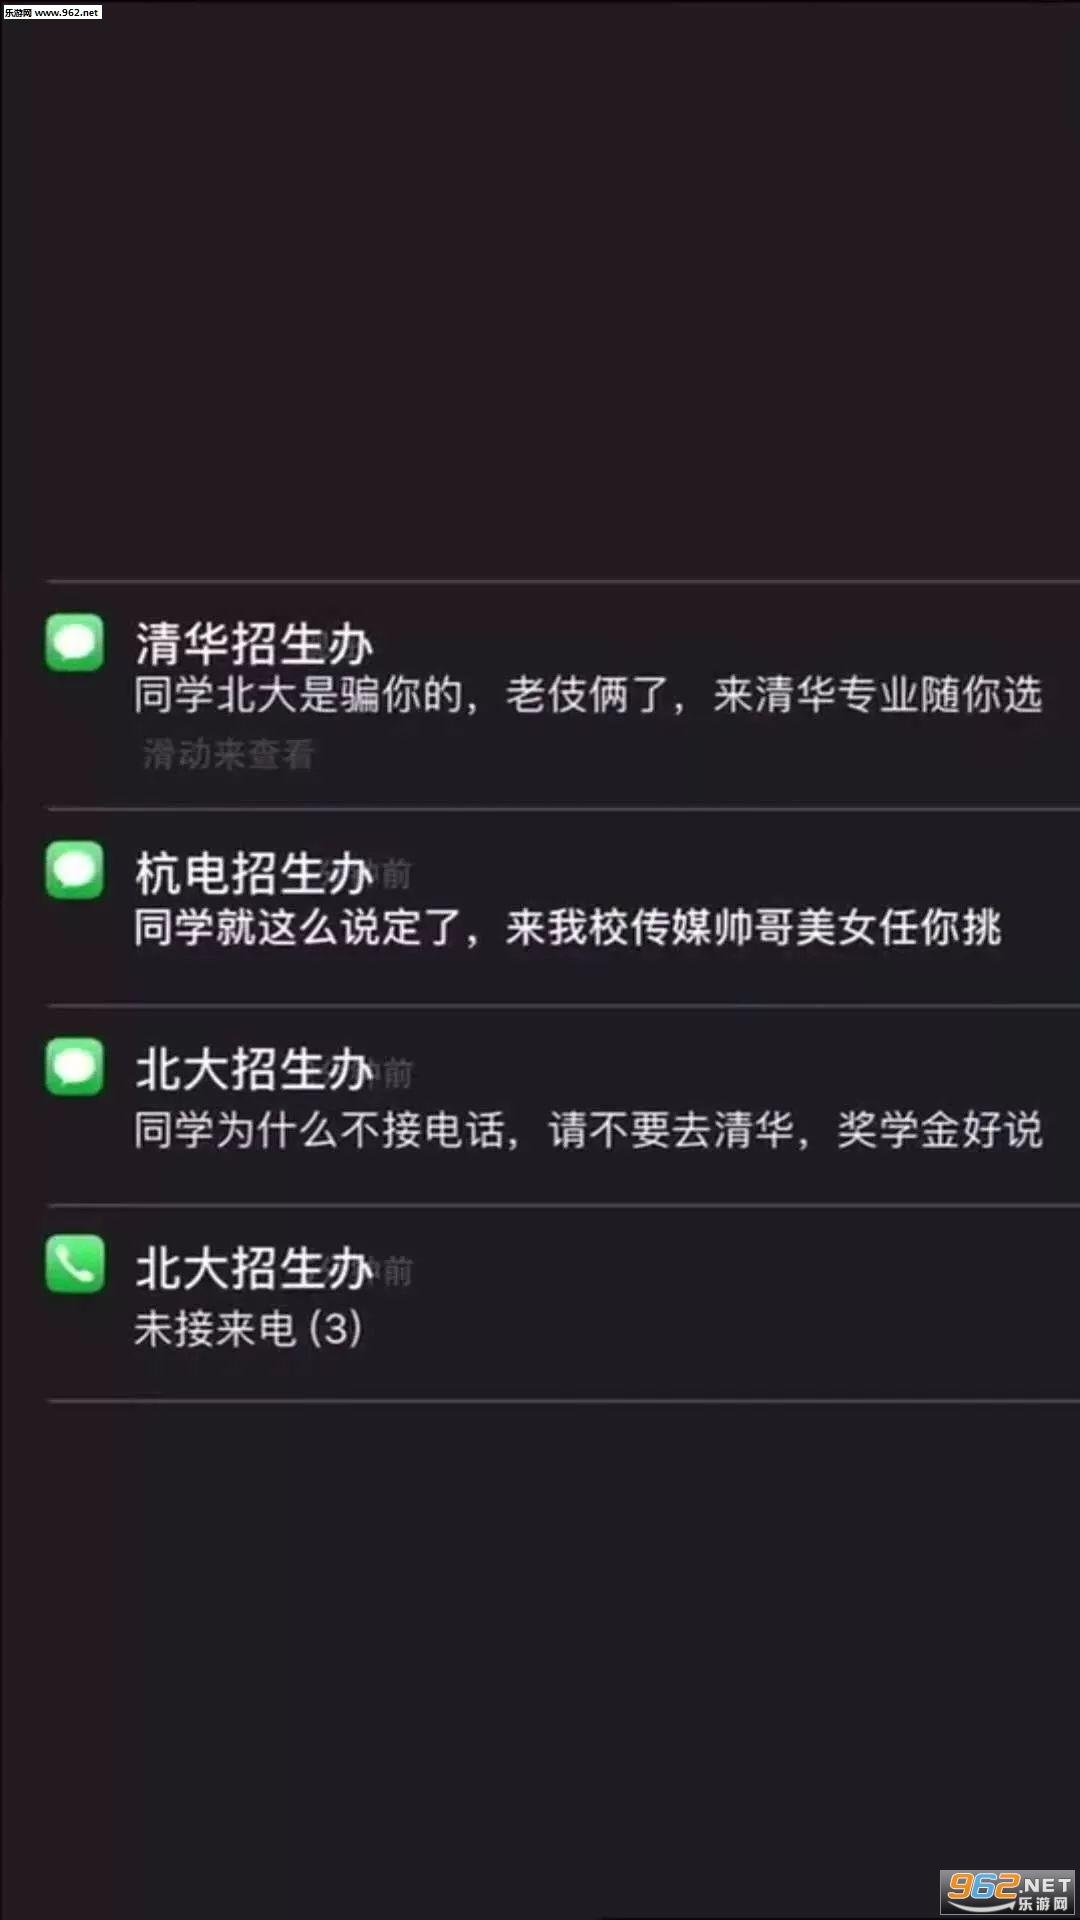 清�A招生�k�黼�截�D�D片截�D3